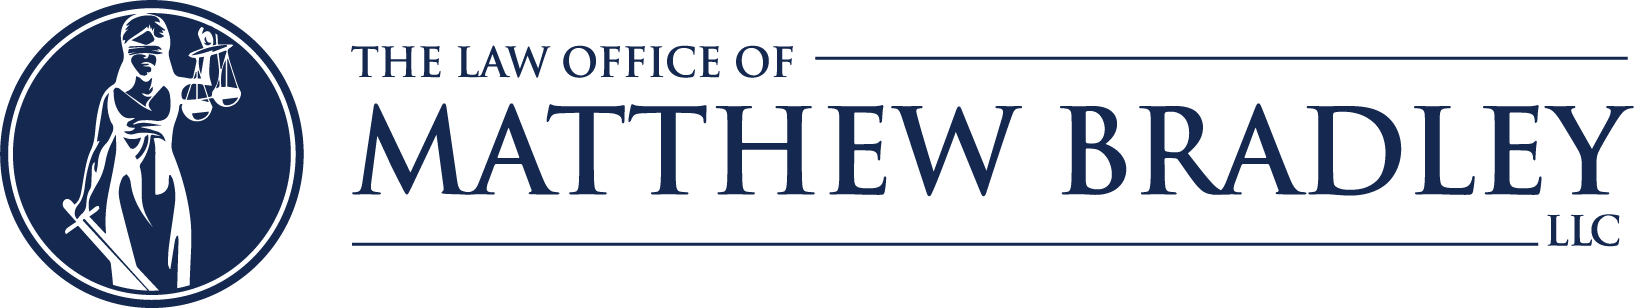 The Law Office of Matthew Bradley, LLC